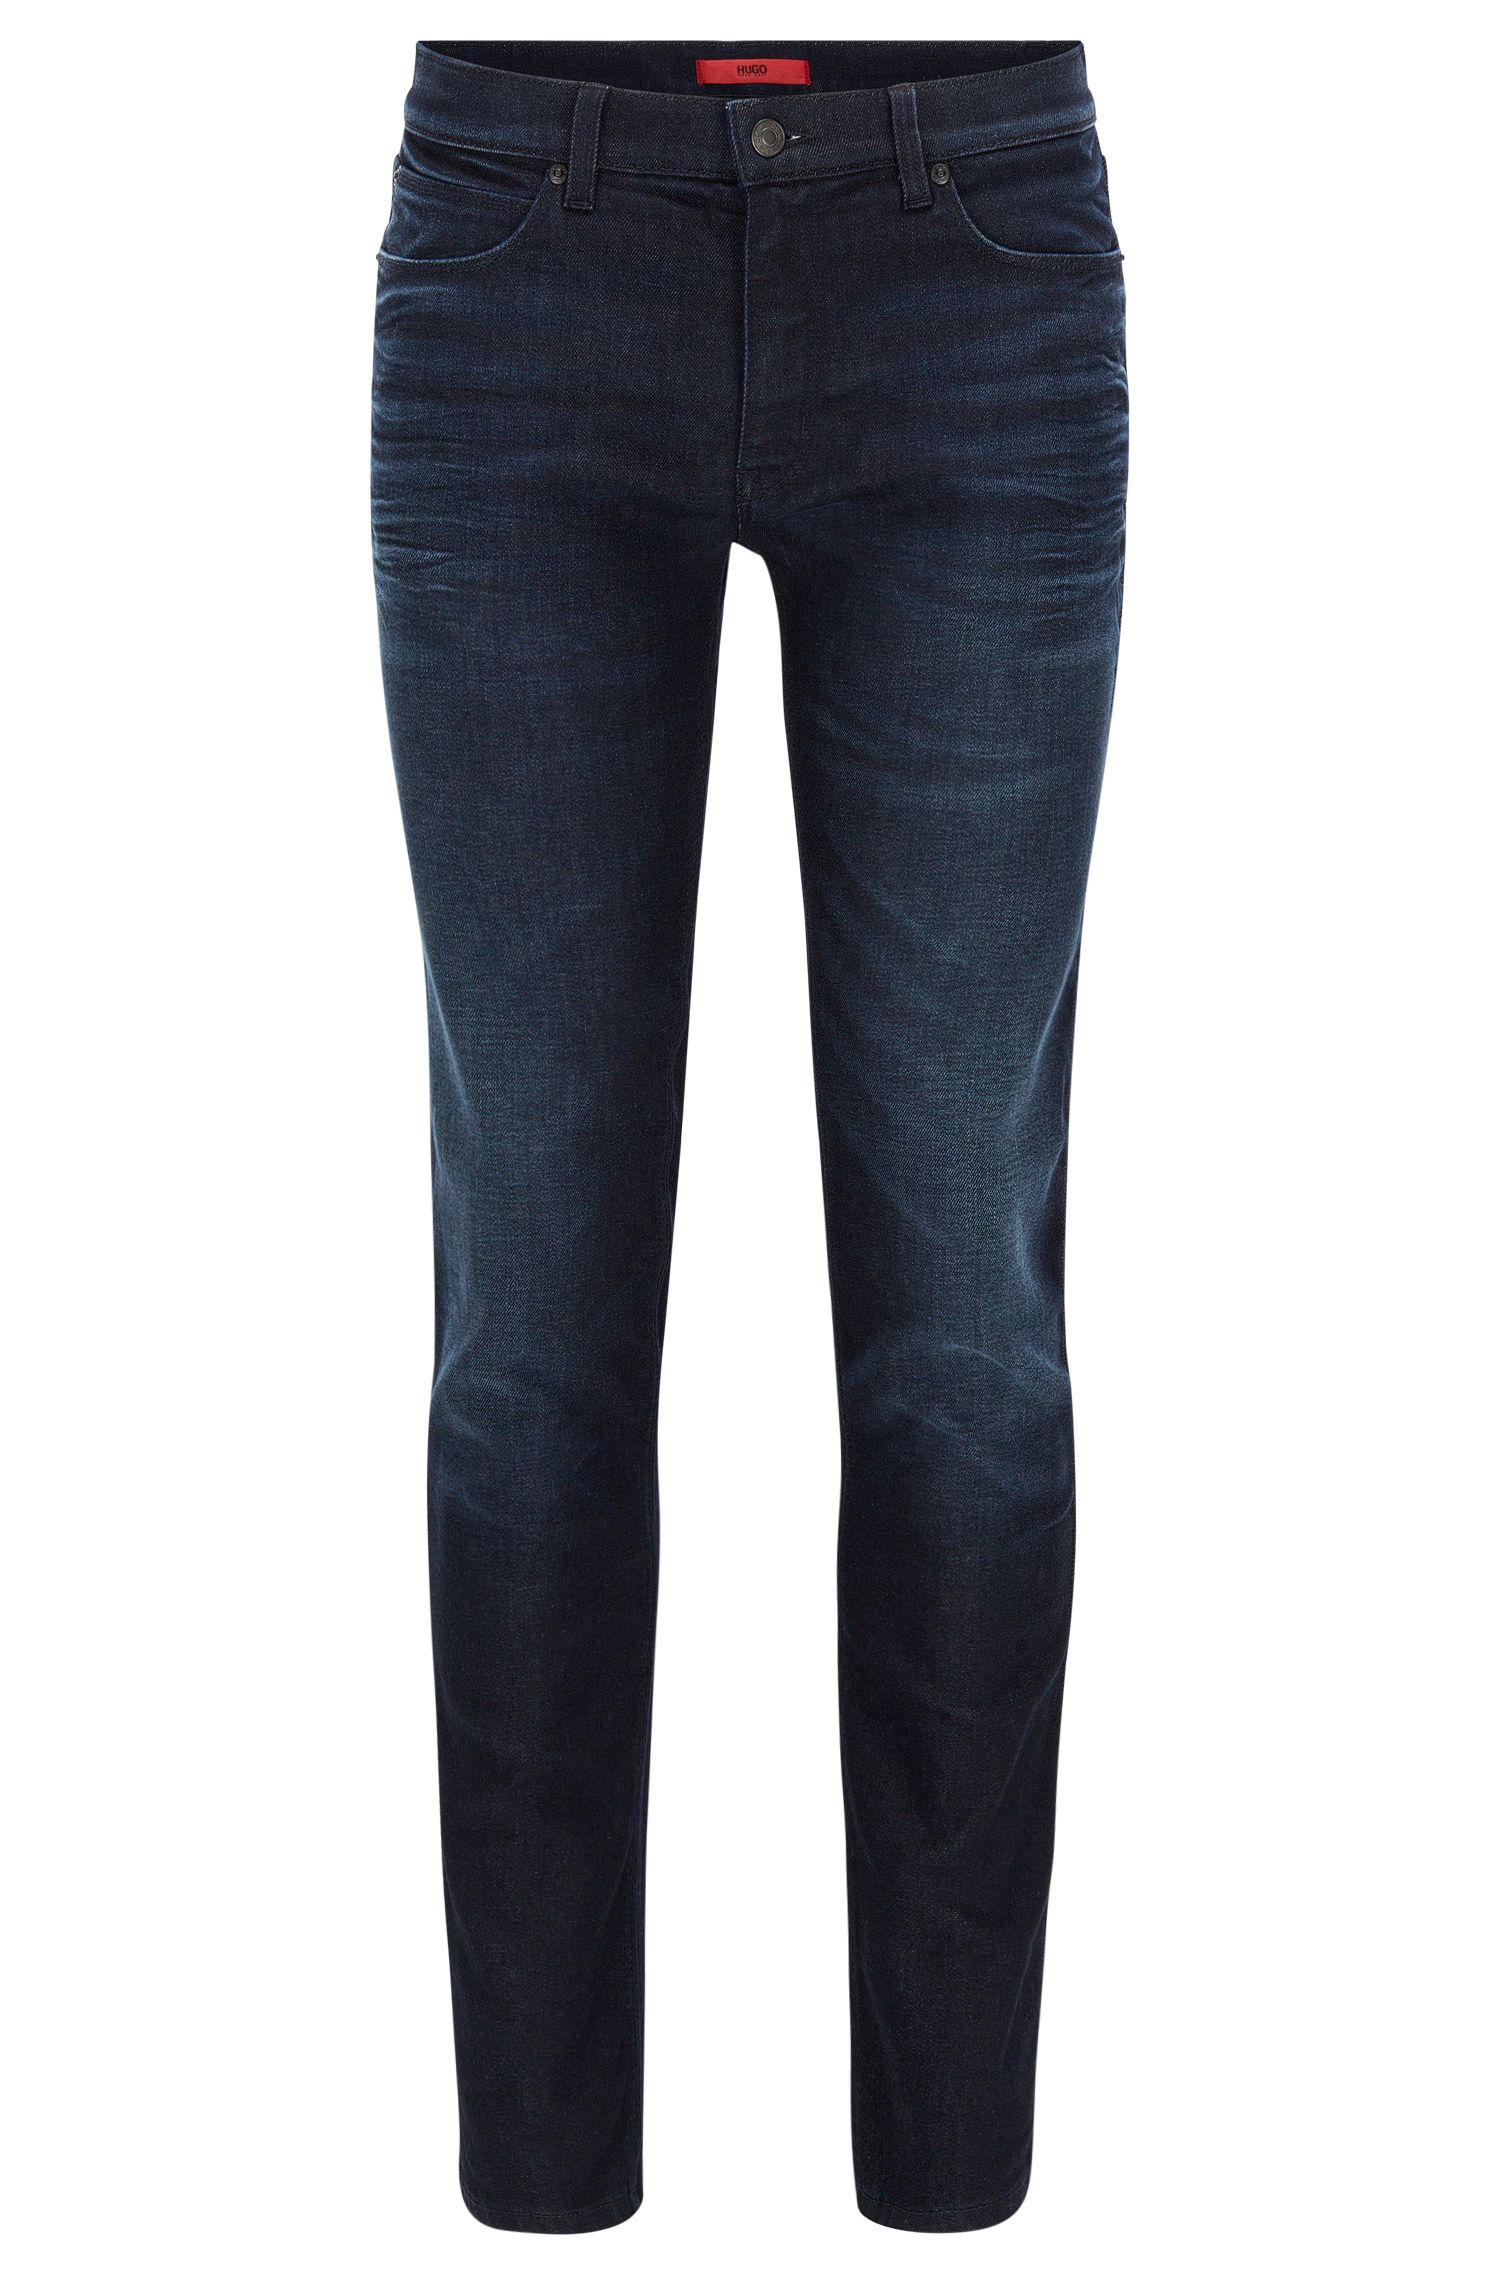 Jeans Slim Fit stay-dark en denim stretch